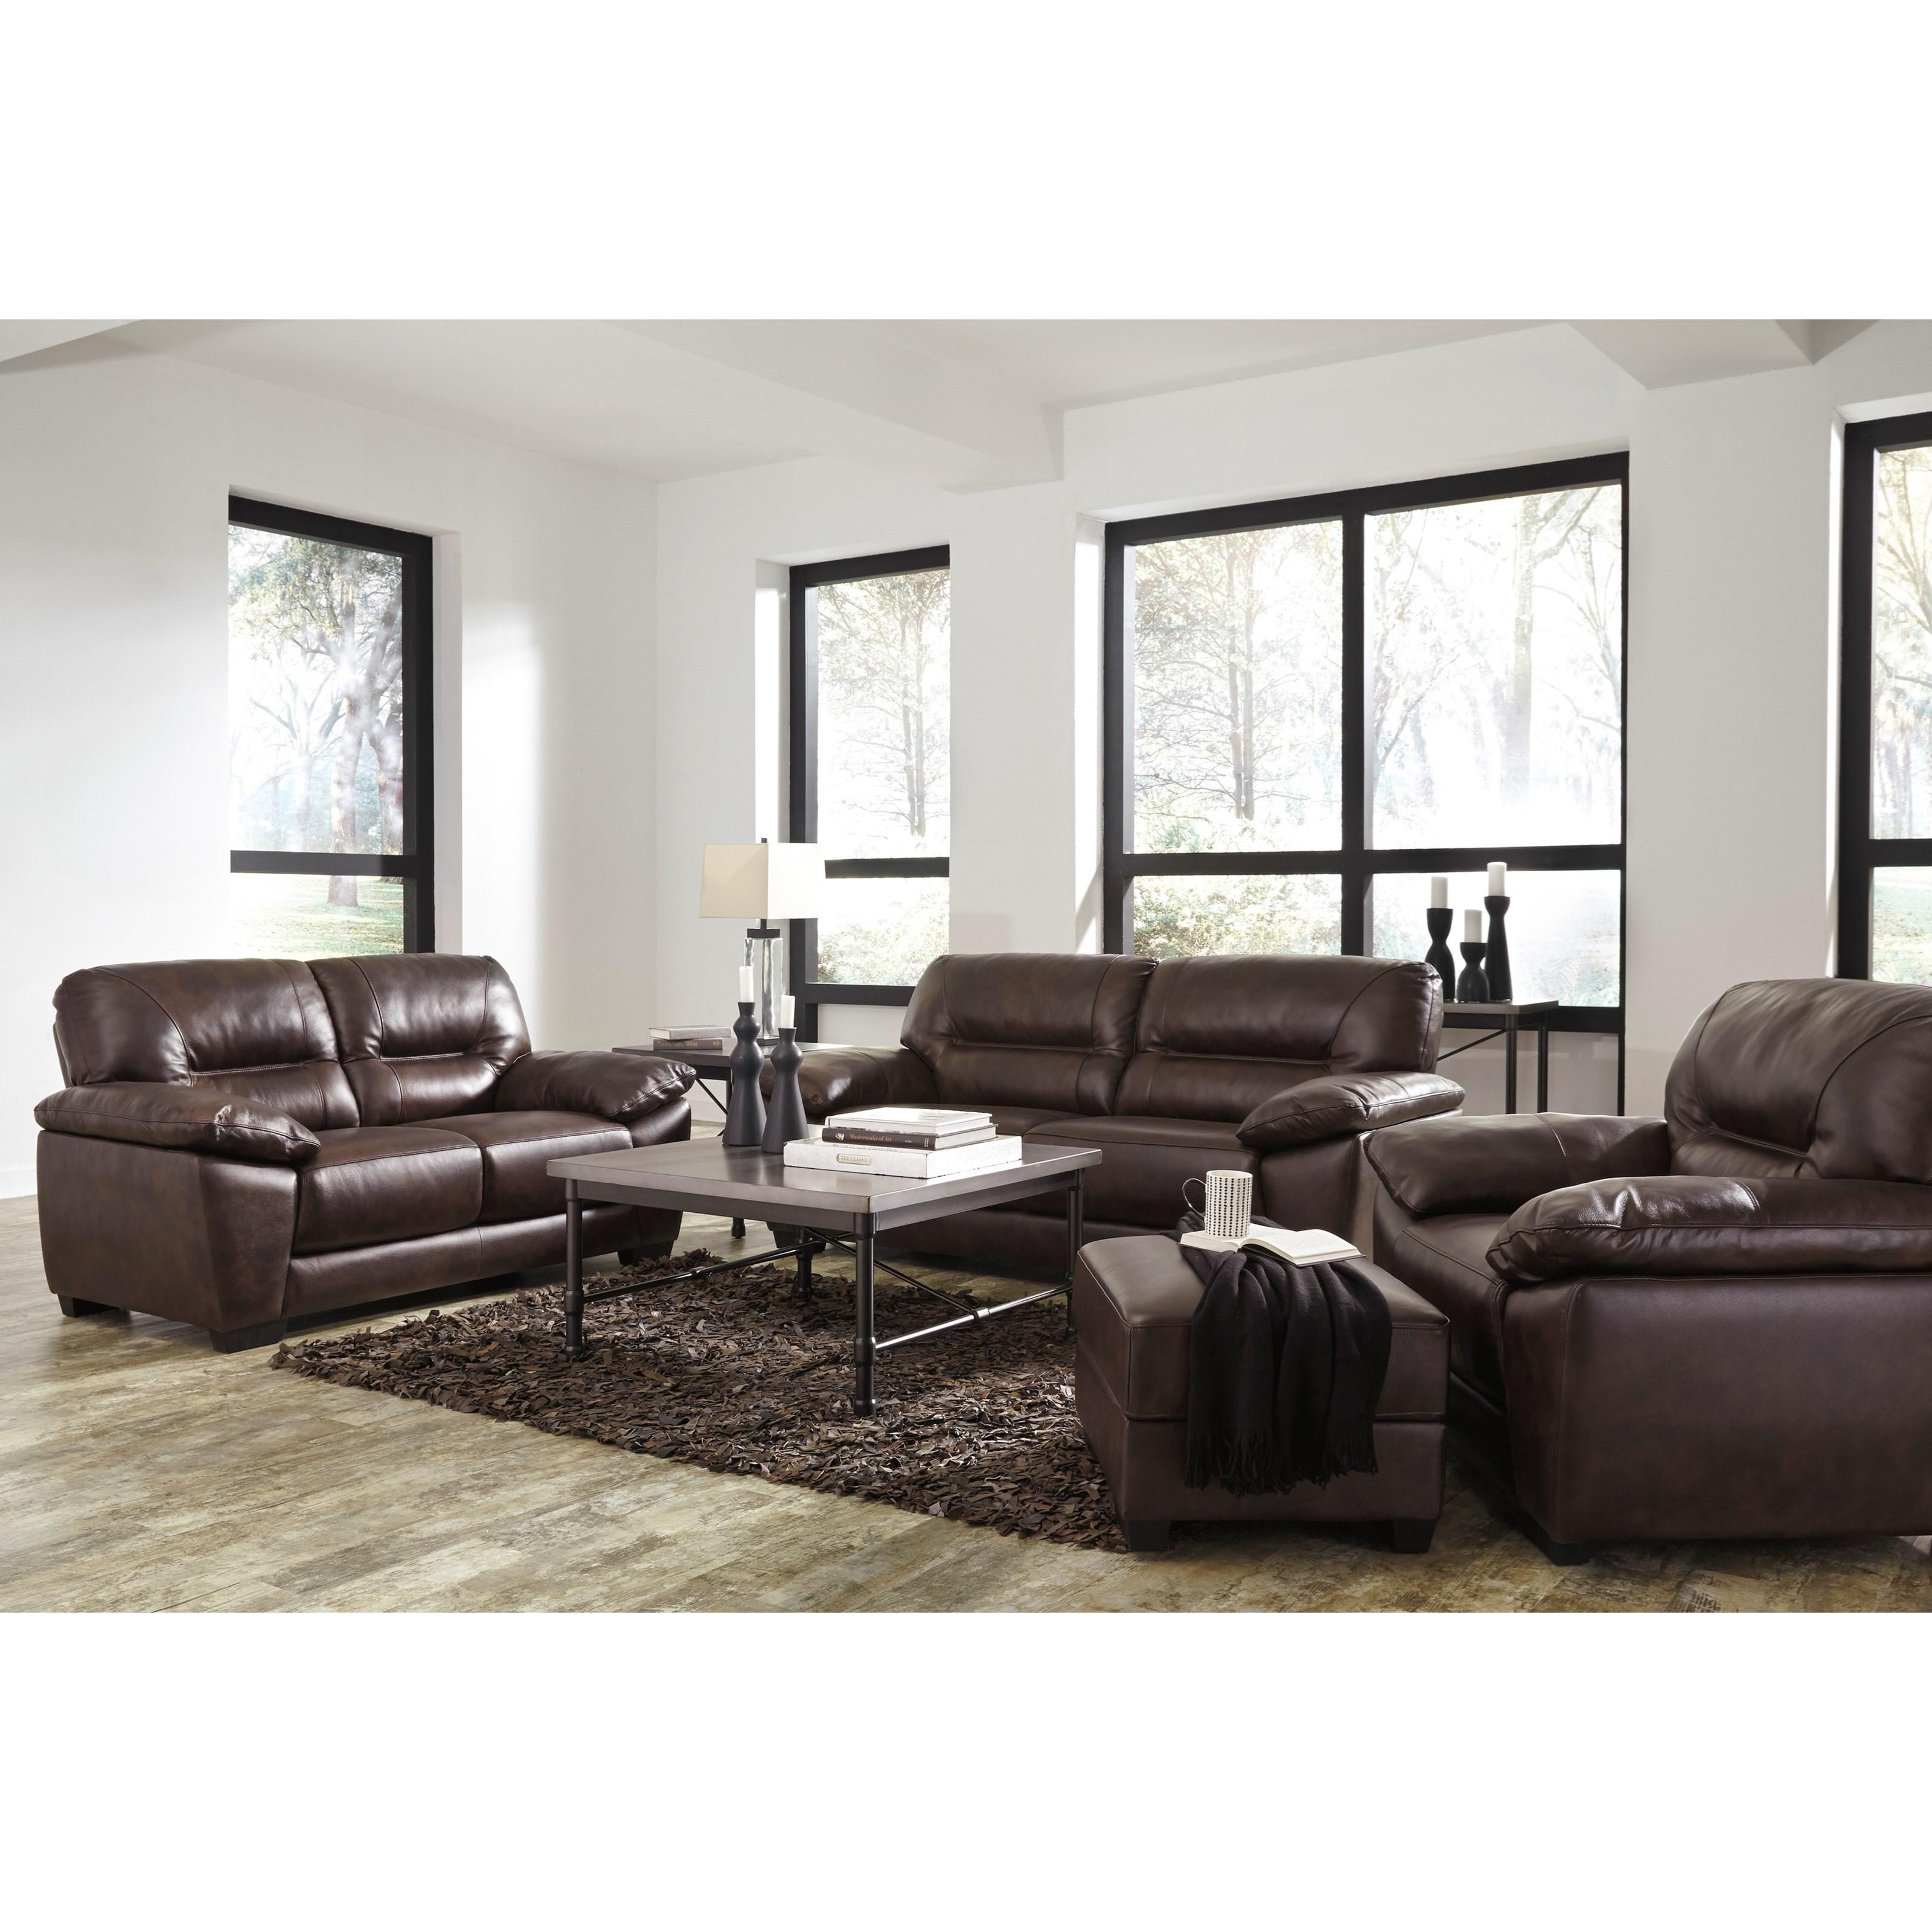 Ashley Signature Design Mellen Living Room Group